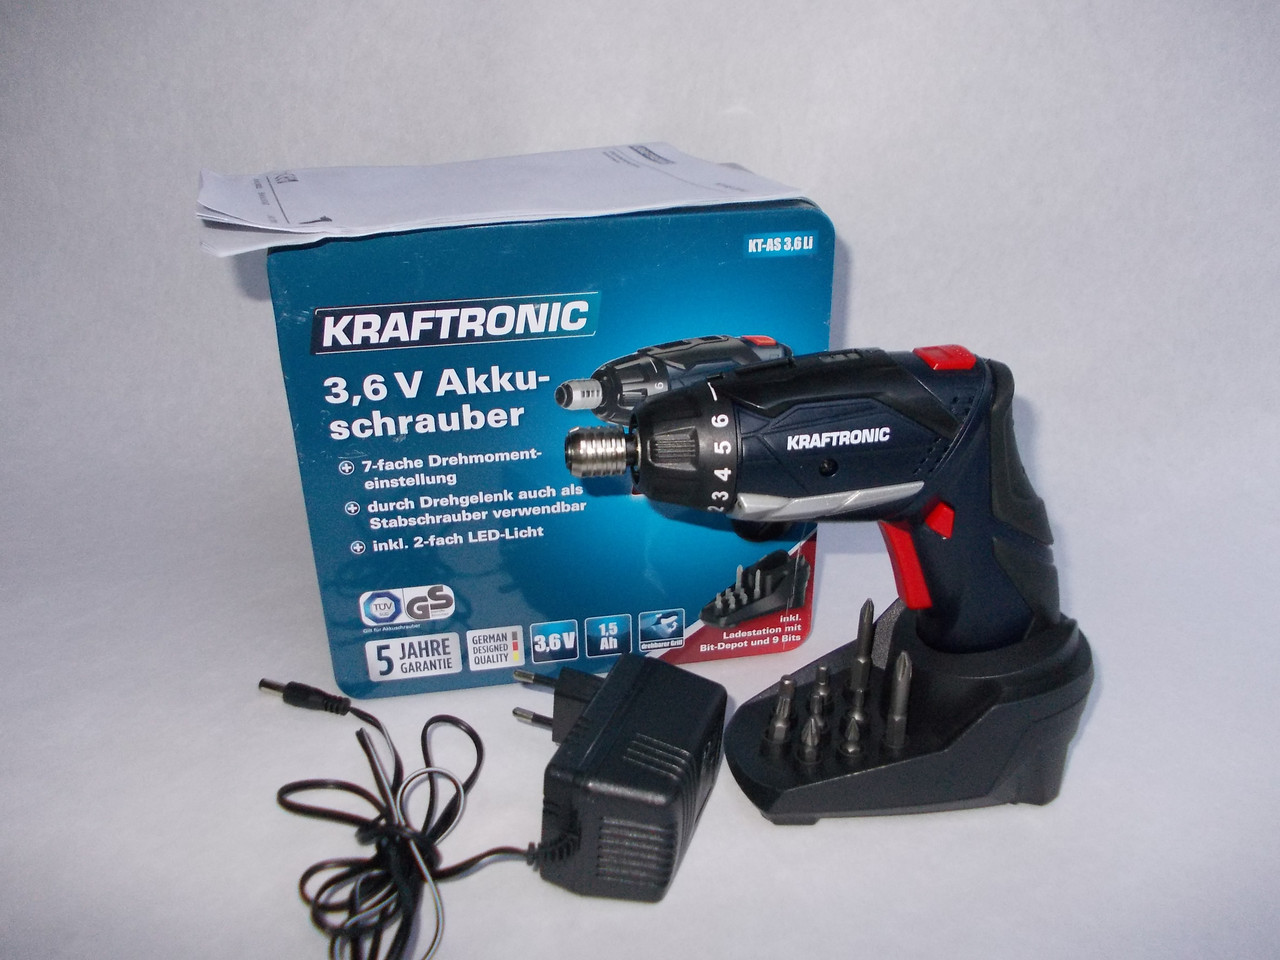 Отвертка аккумуляторная kraftronic kt as 3.6 li : продажа, цена в